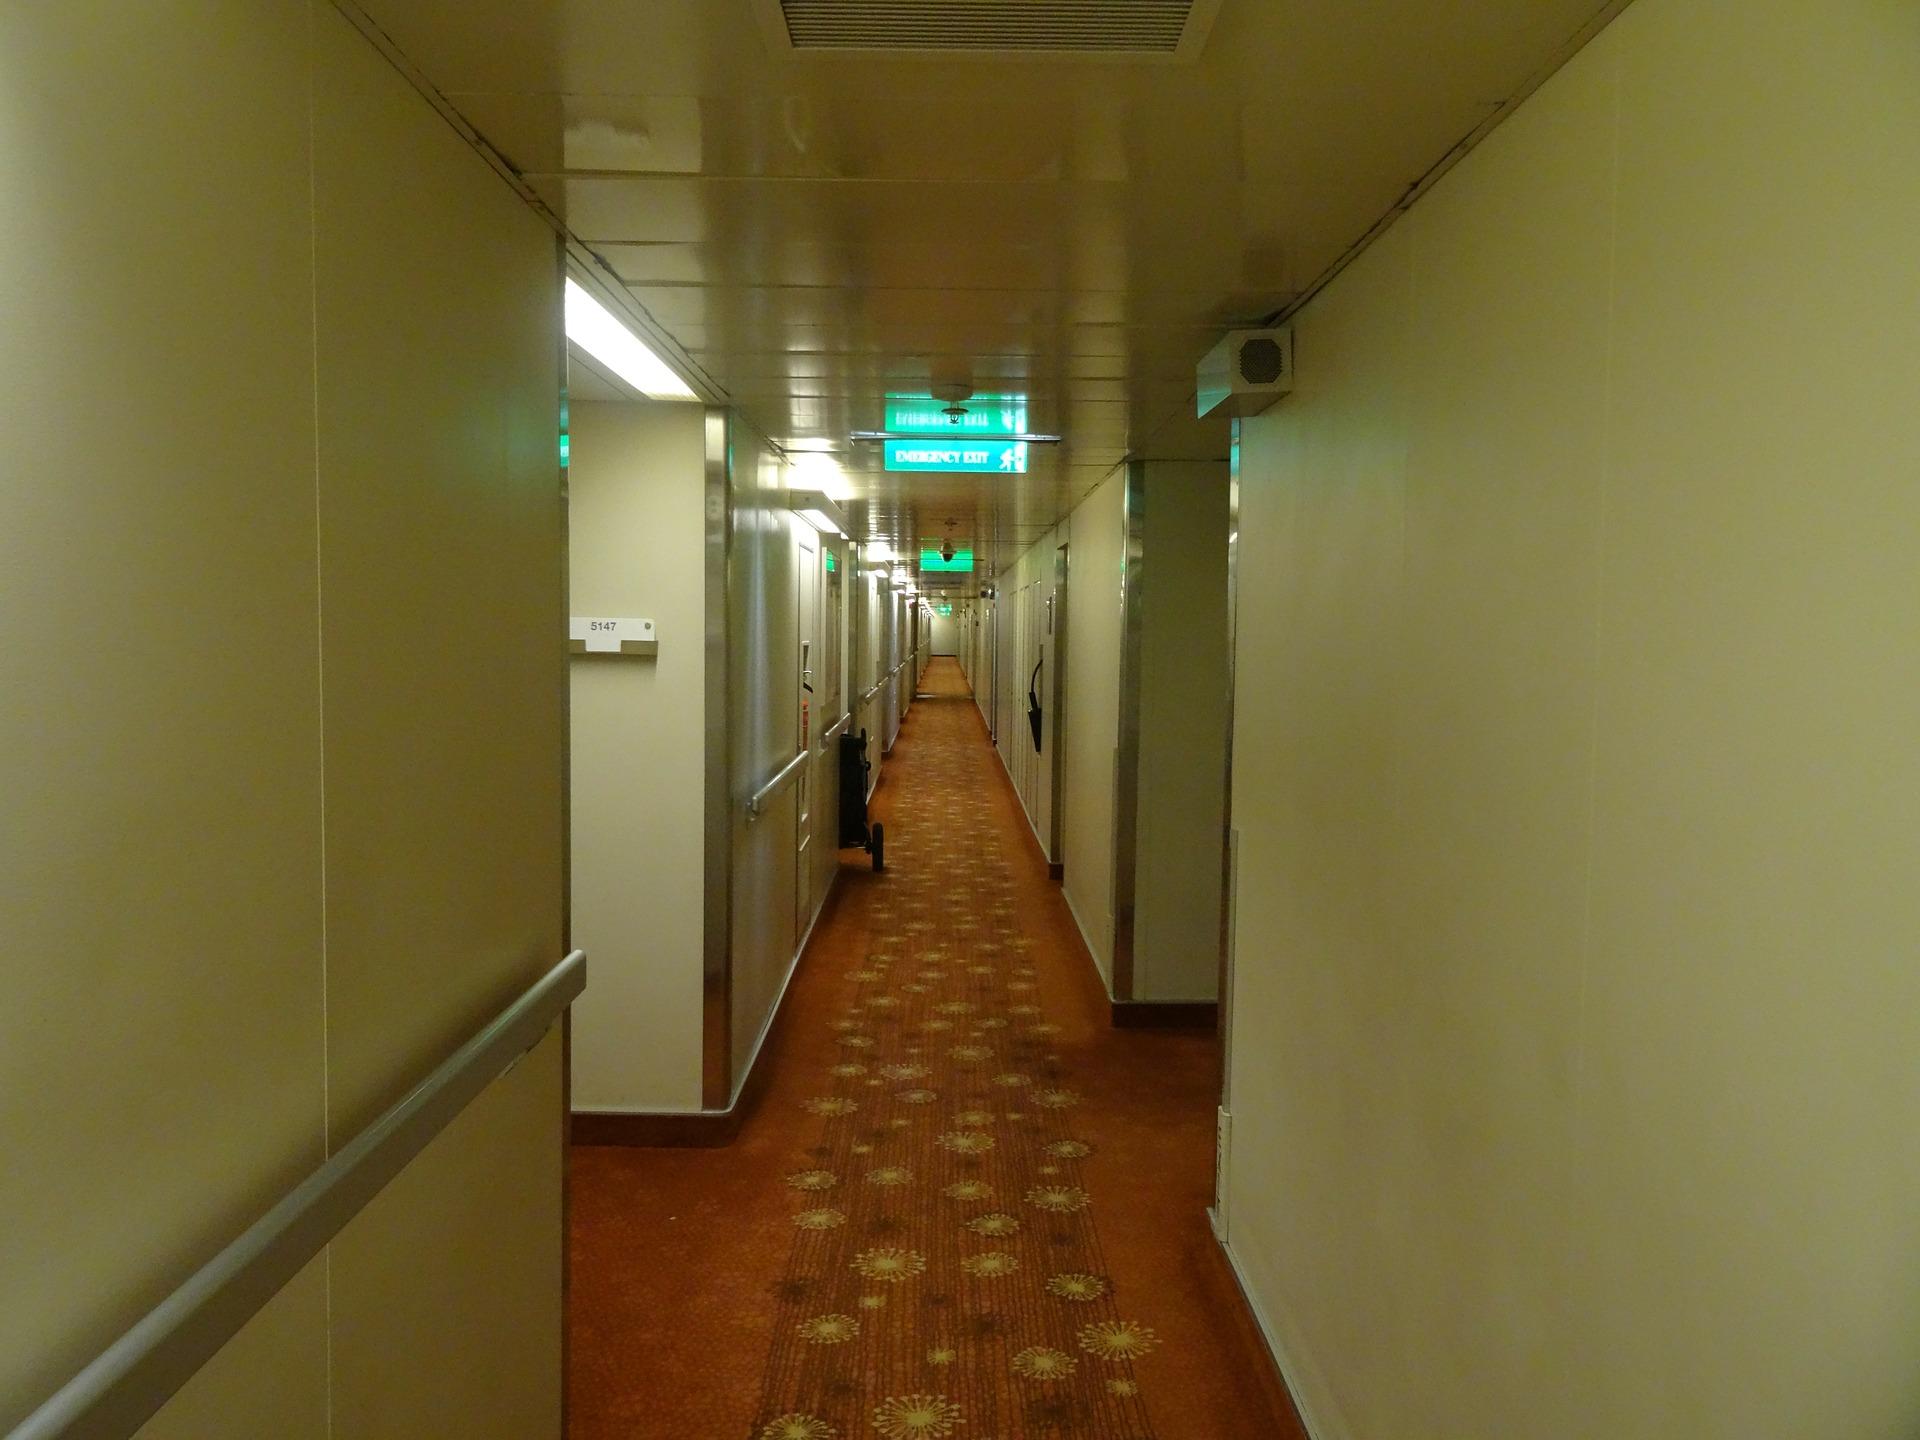 hallway-262474_1920